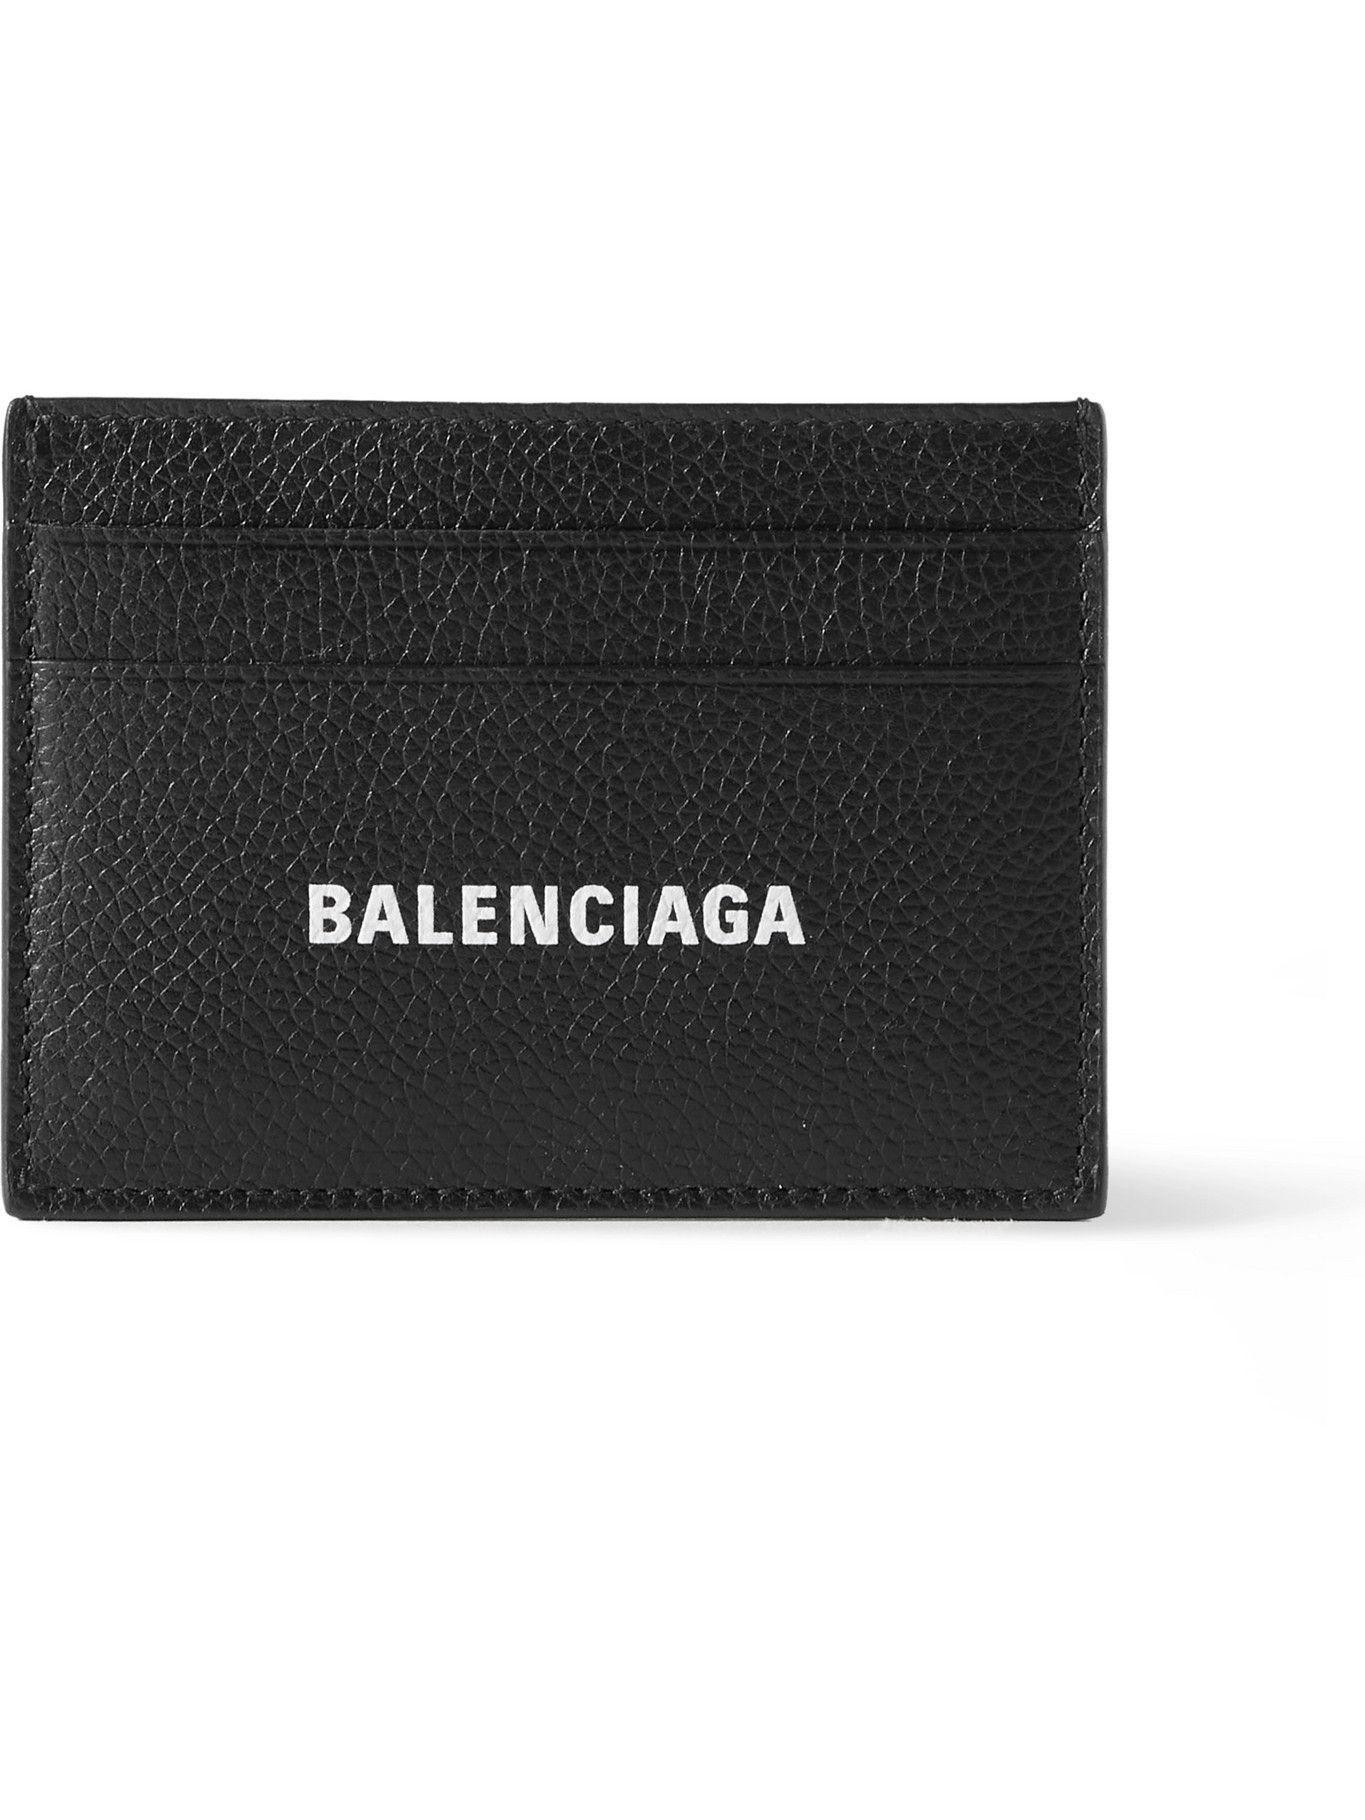 BALENCIAGA - Logo-Print Full-Grain Leather Cardholder